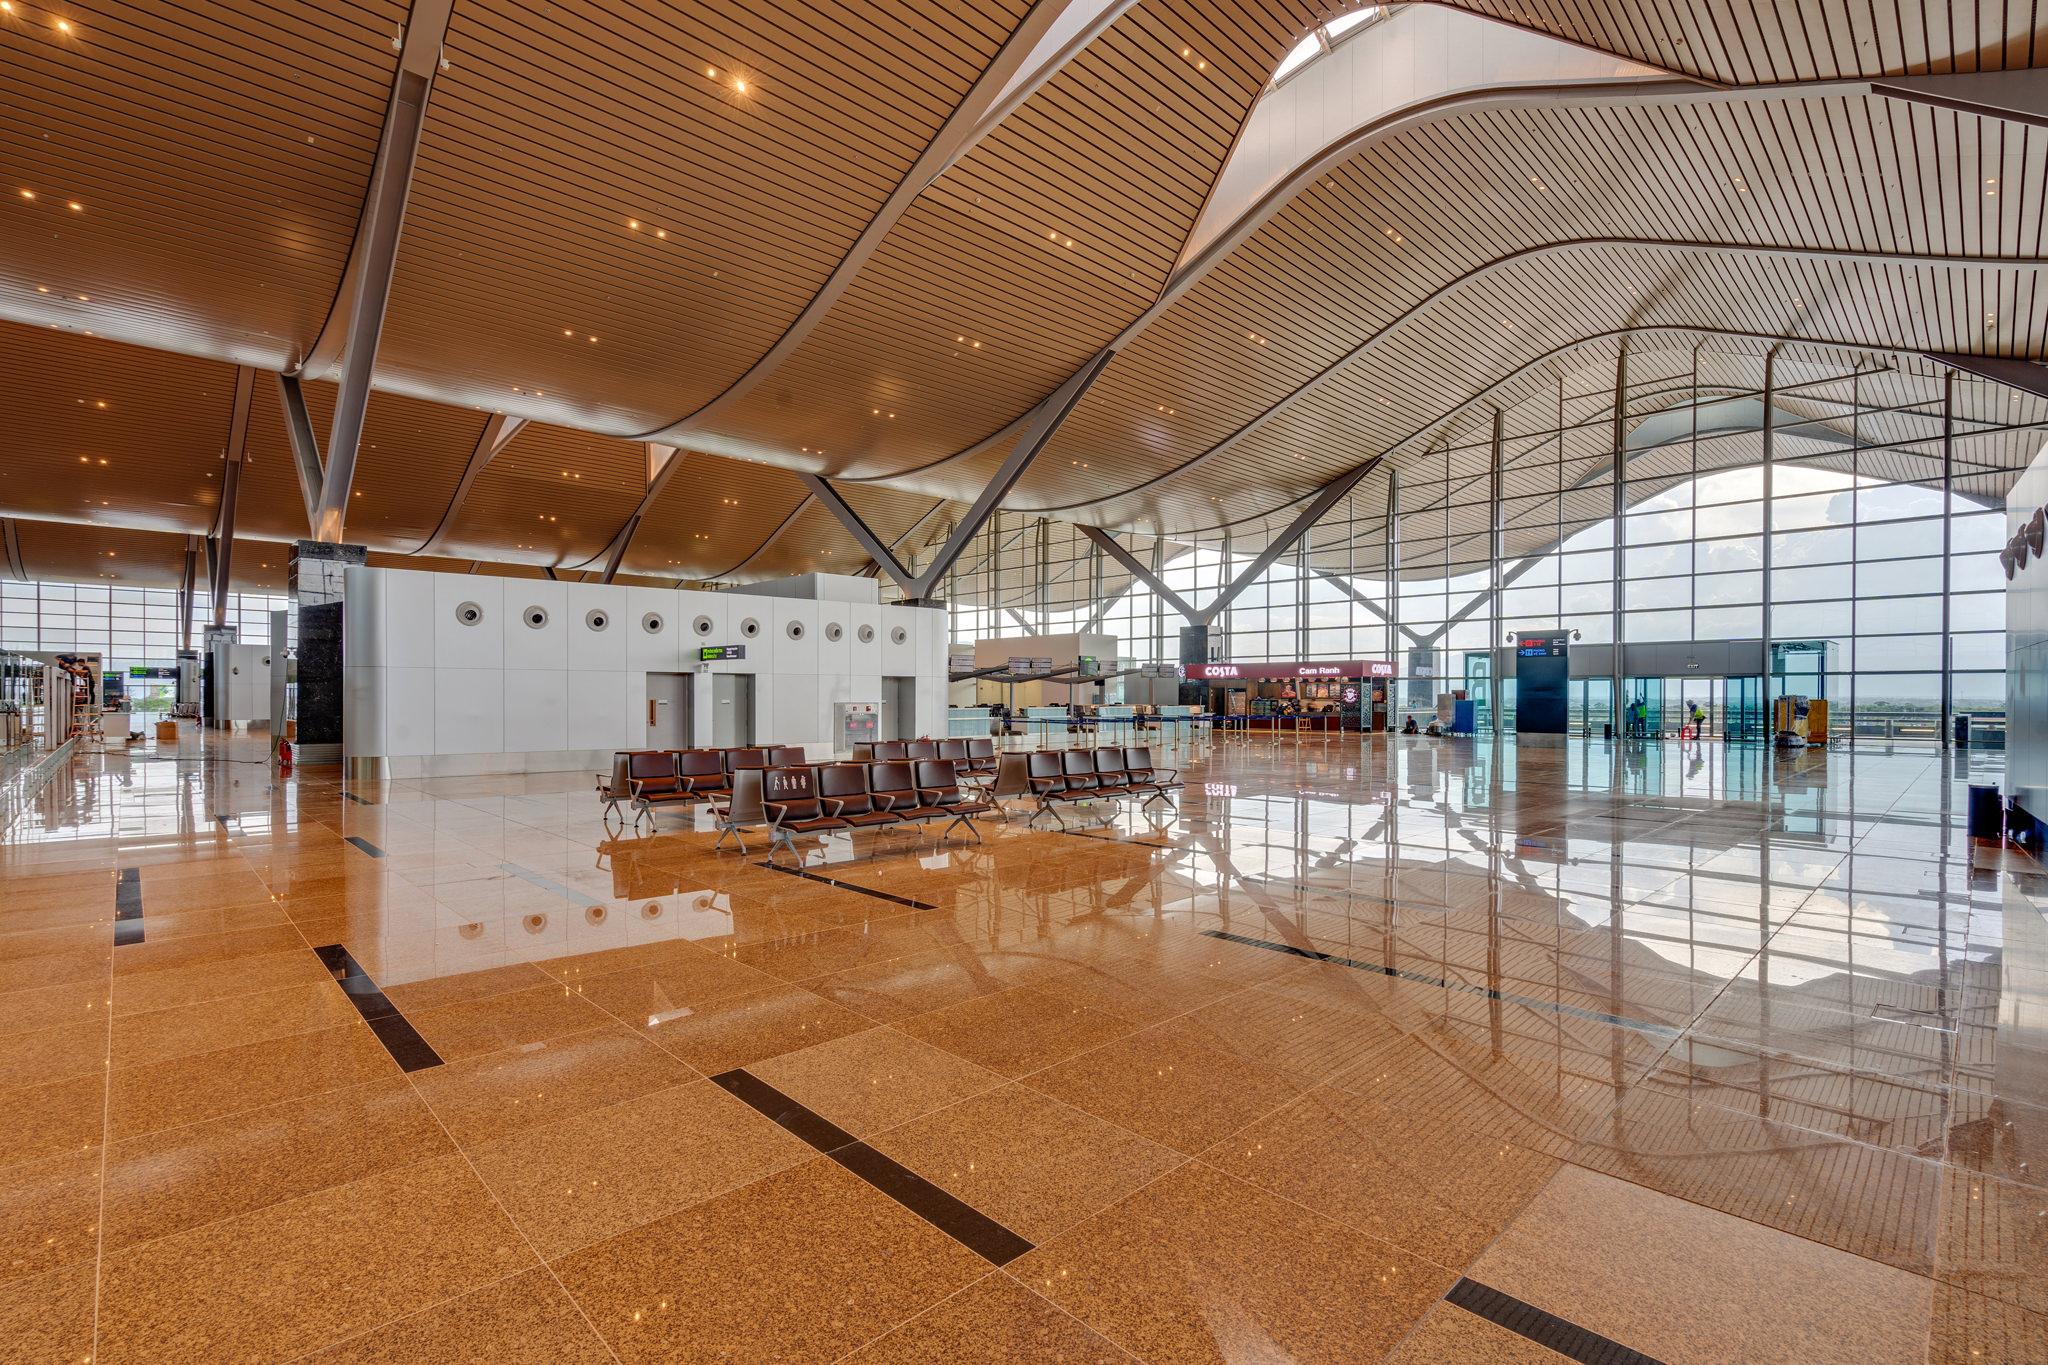 20180626 - Cam Ranh Airport - Architecture - 0323.jpg